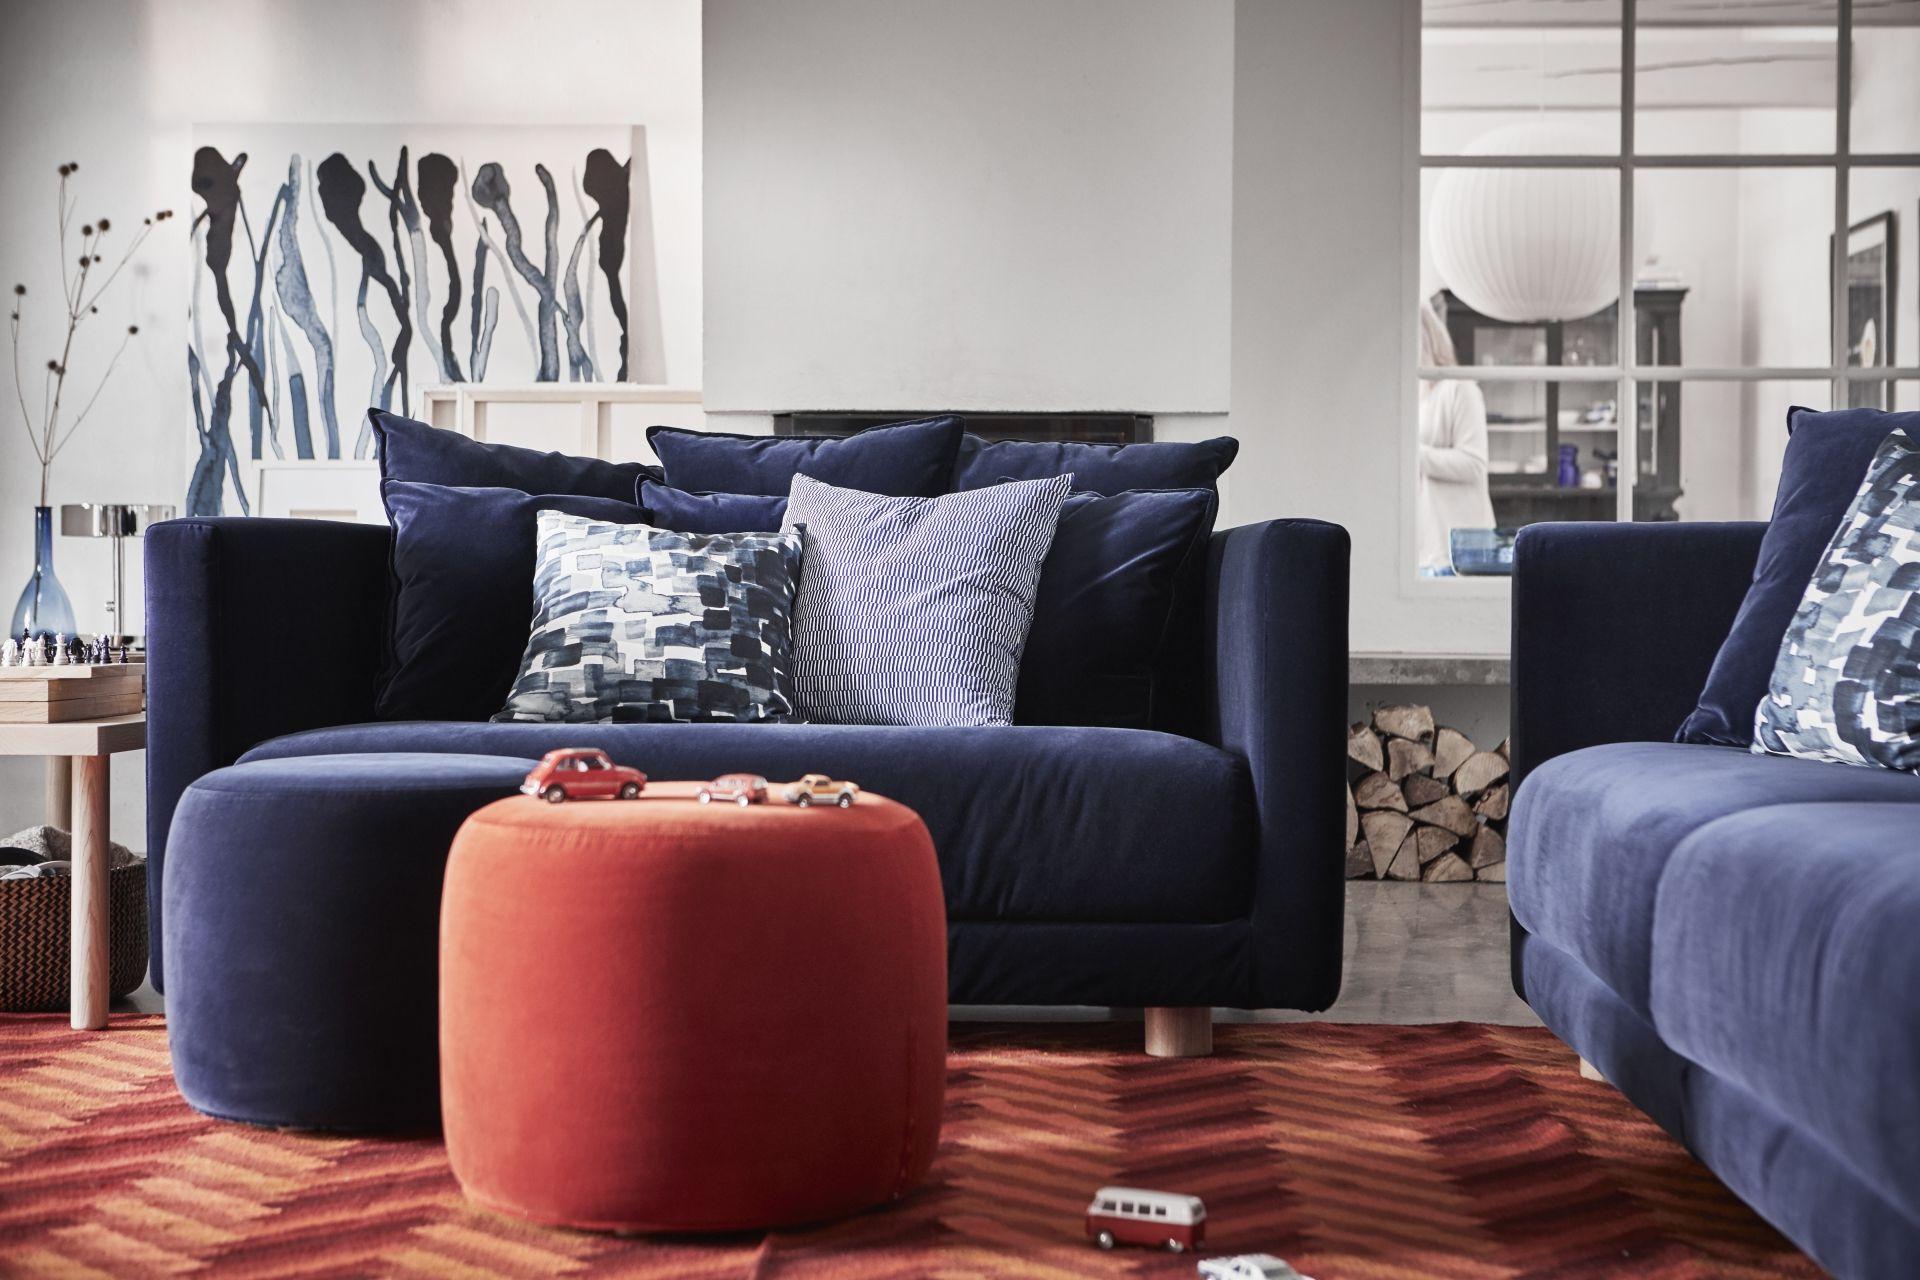 Divano Velluto Blu Ikea stockholm 2017 pouf - sandbacka grigio scuro | divano ikea